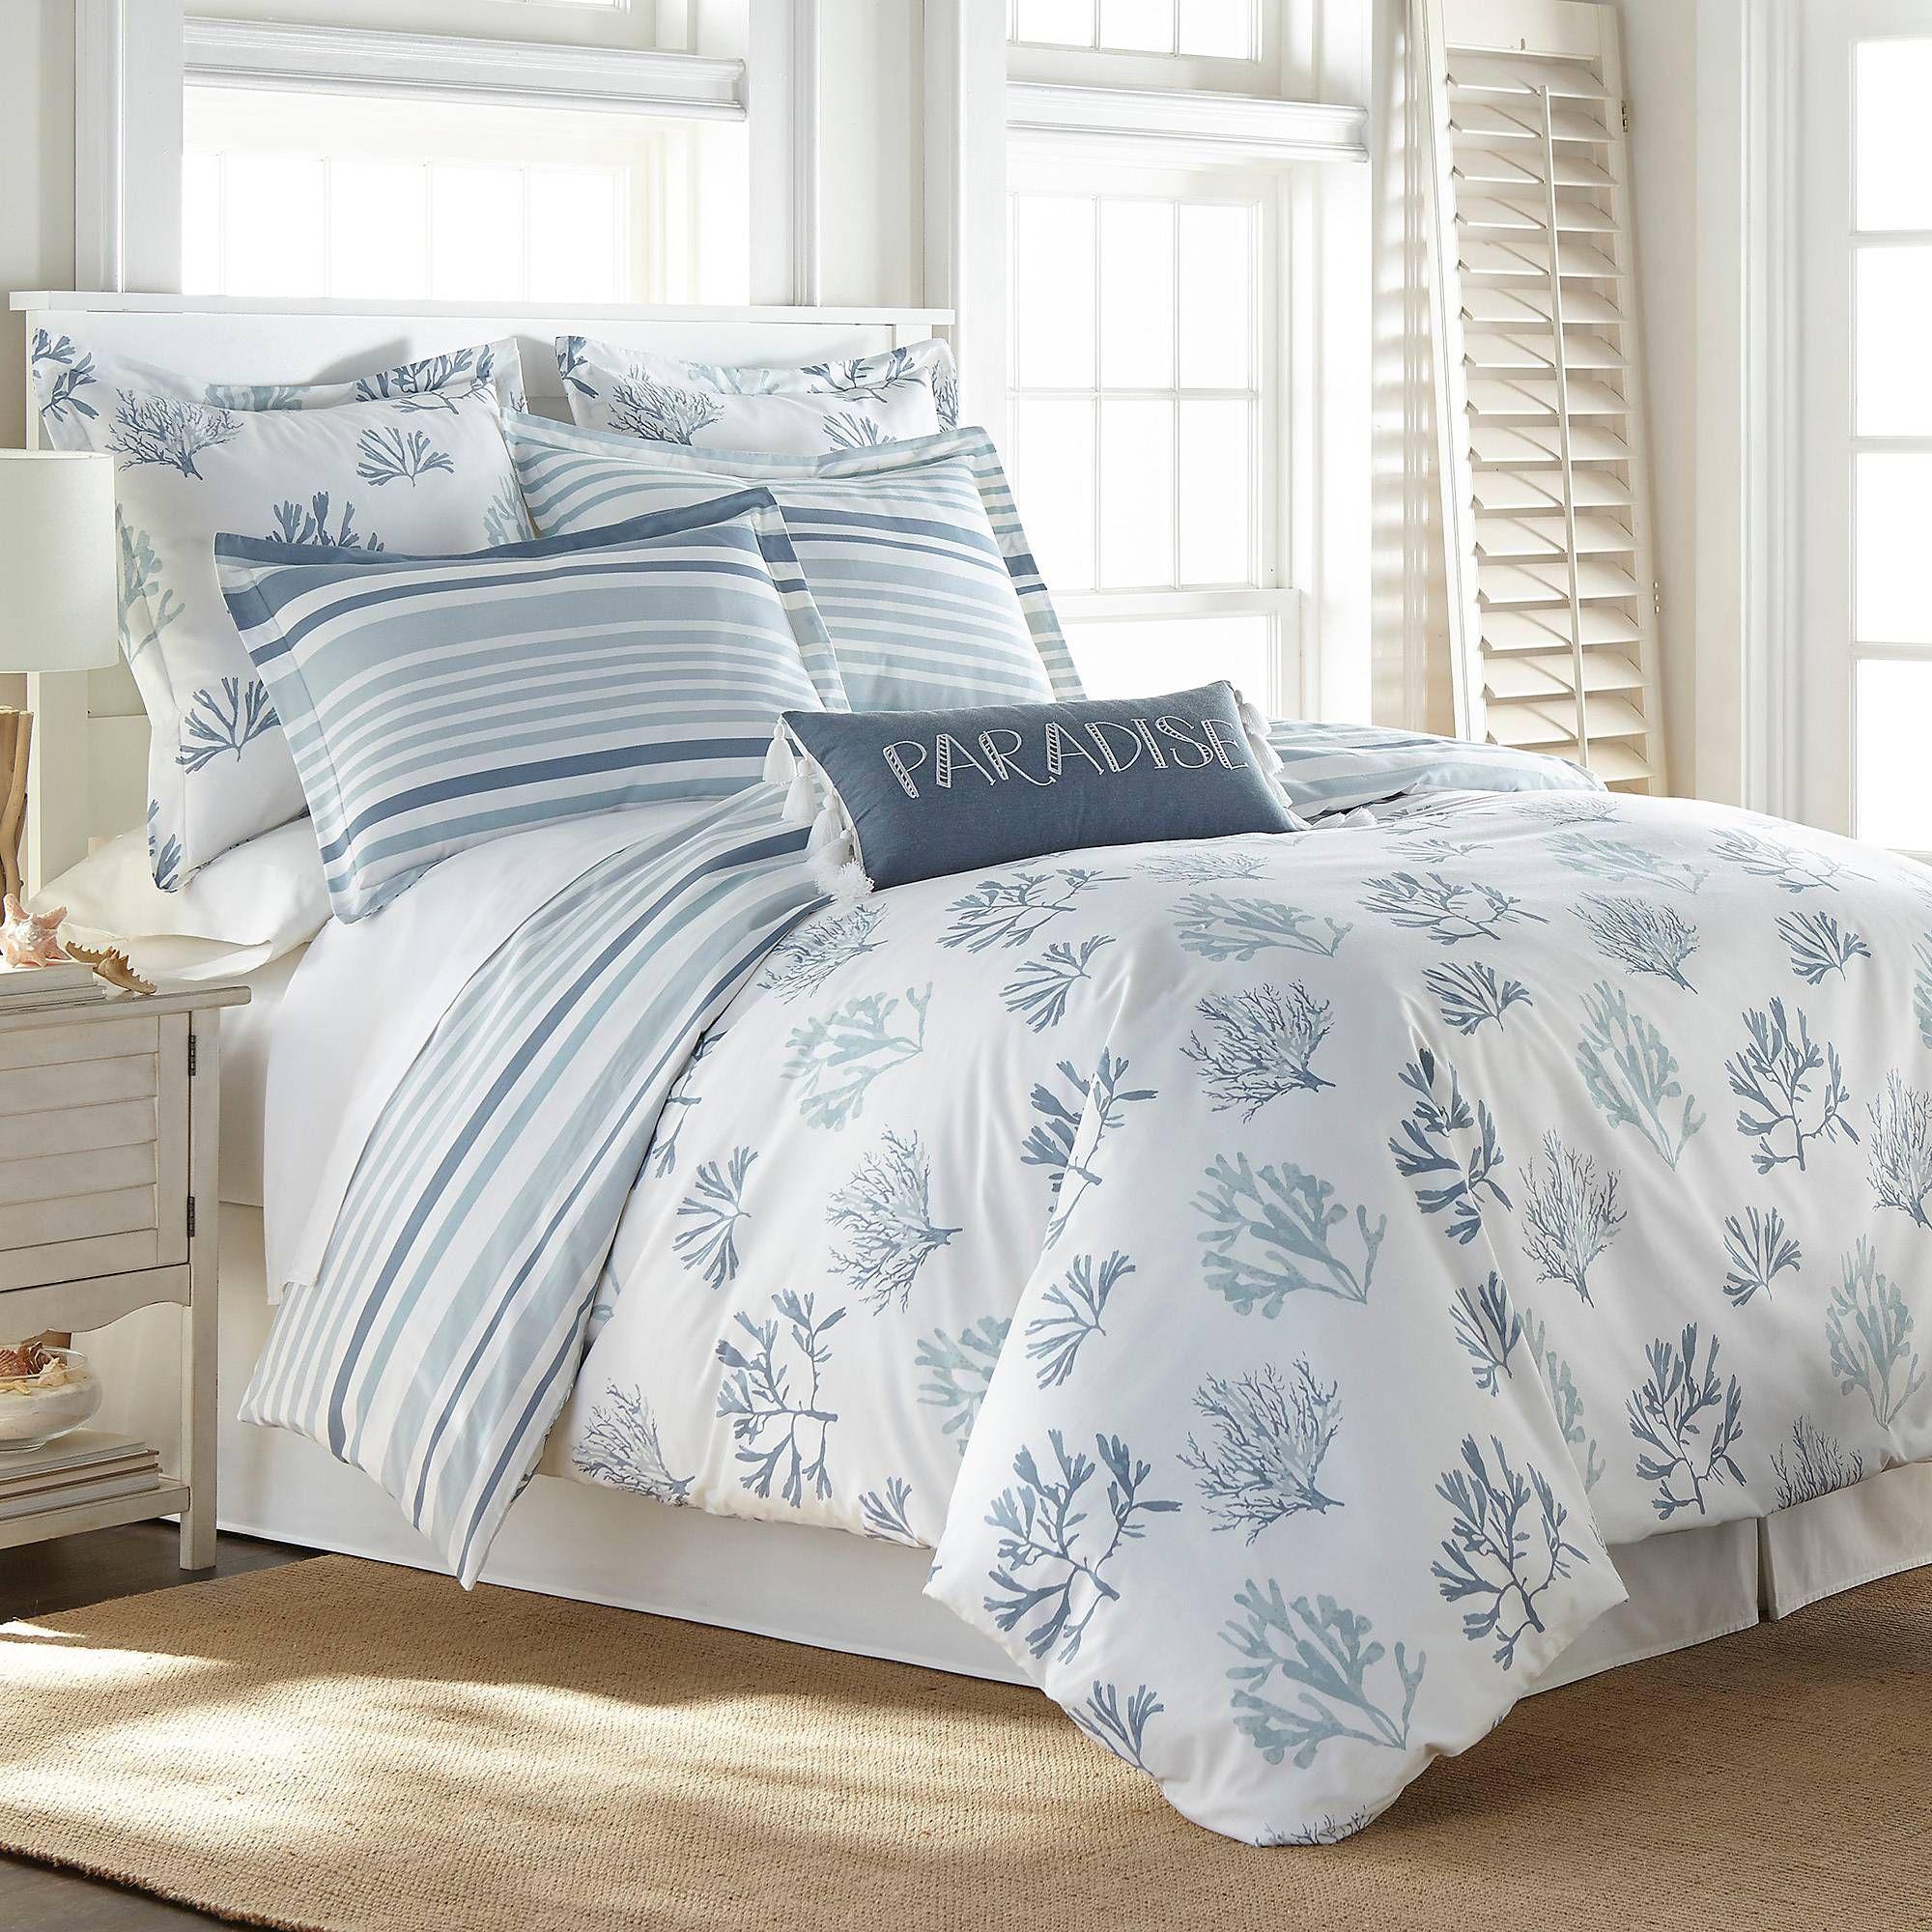 Coastal Living® Truro Bedding Collecton Bed Bath